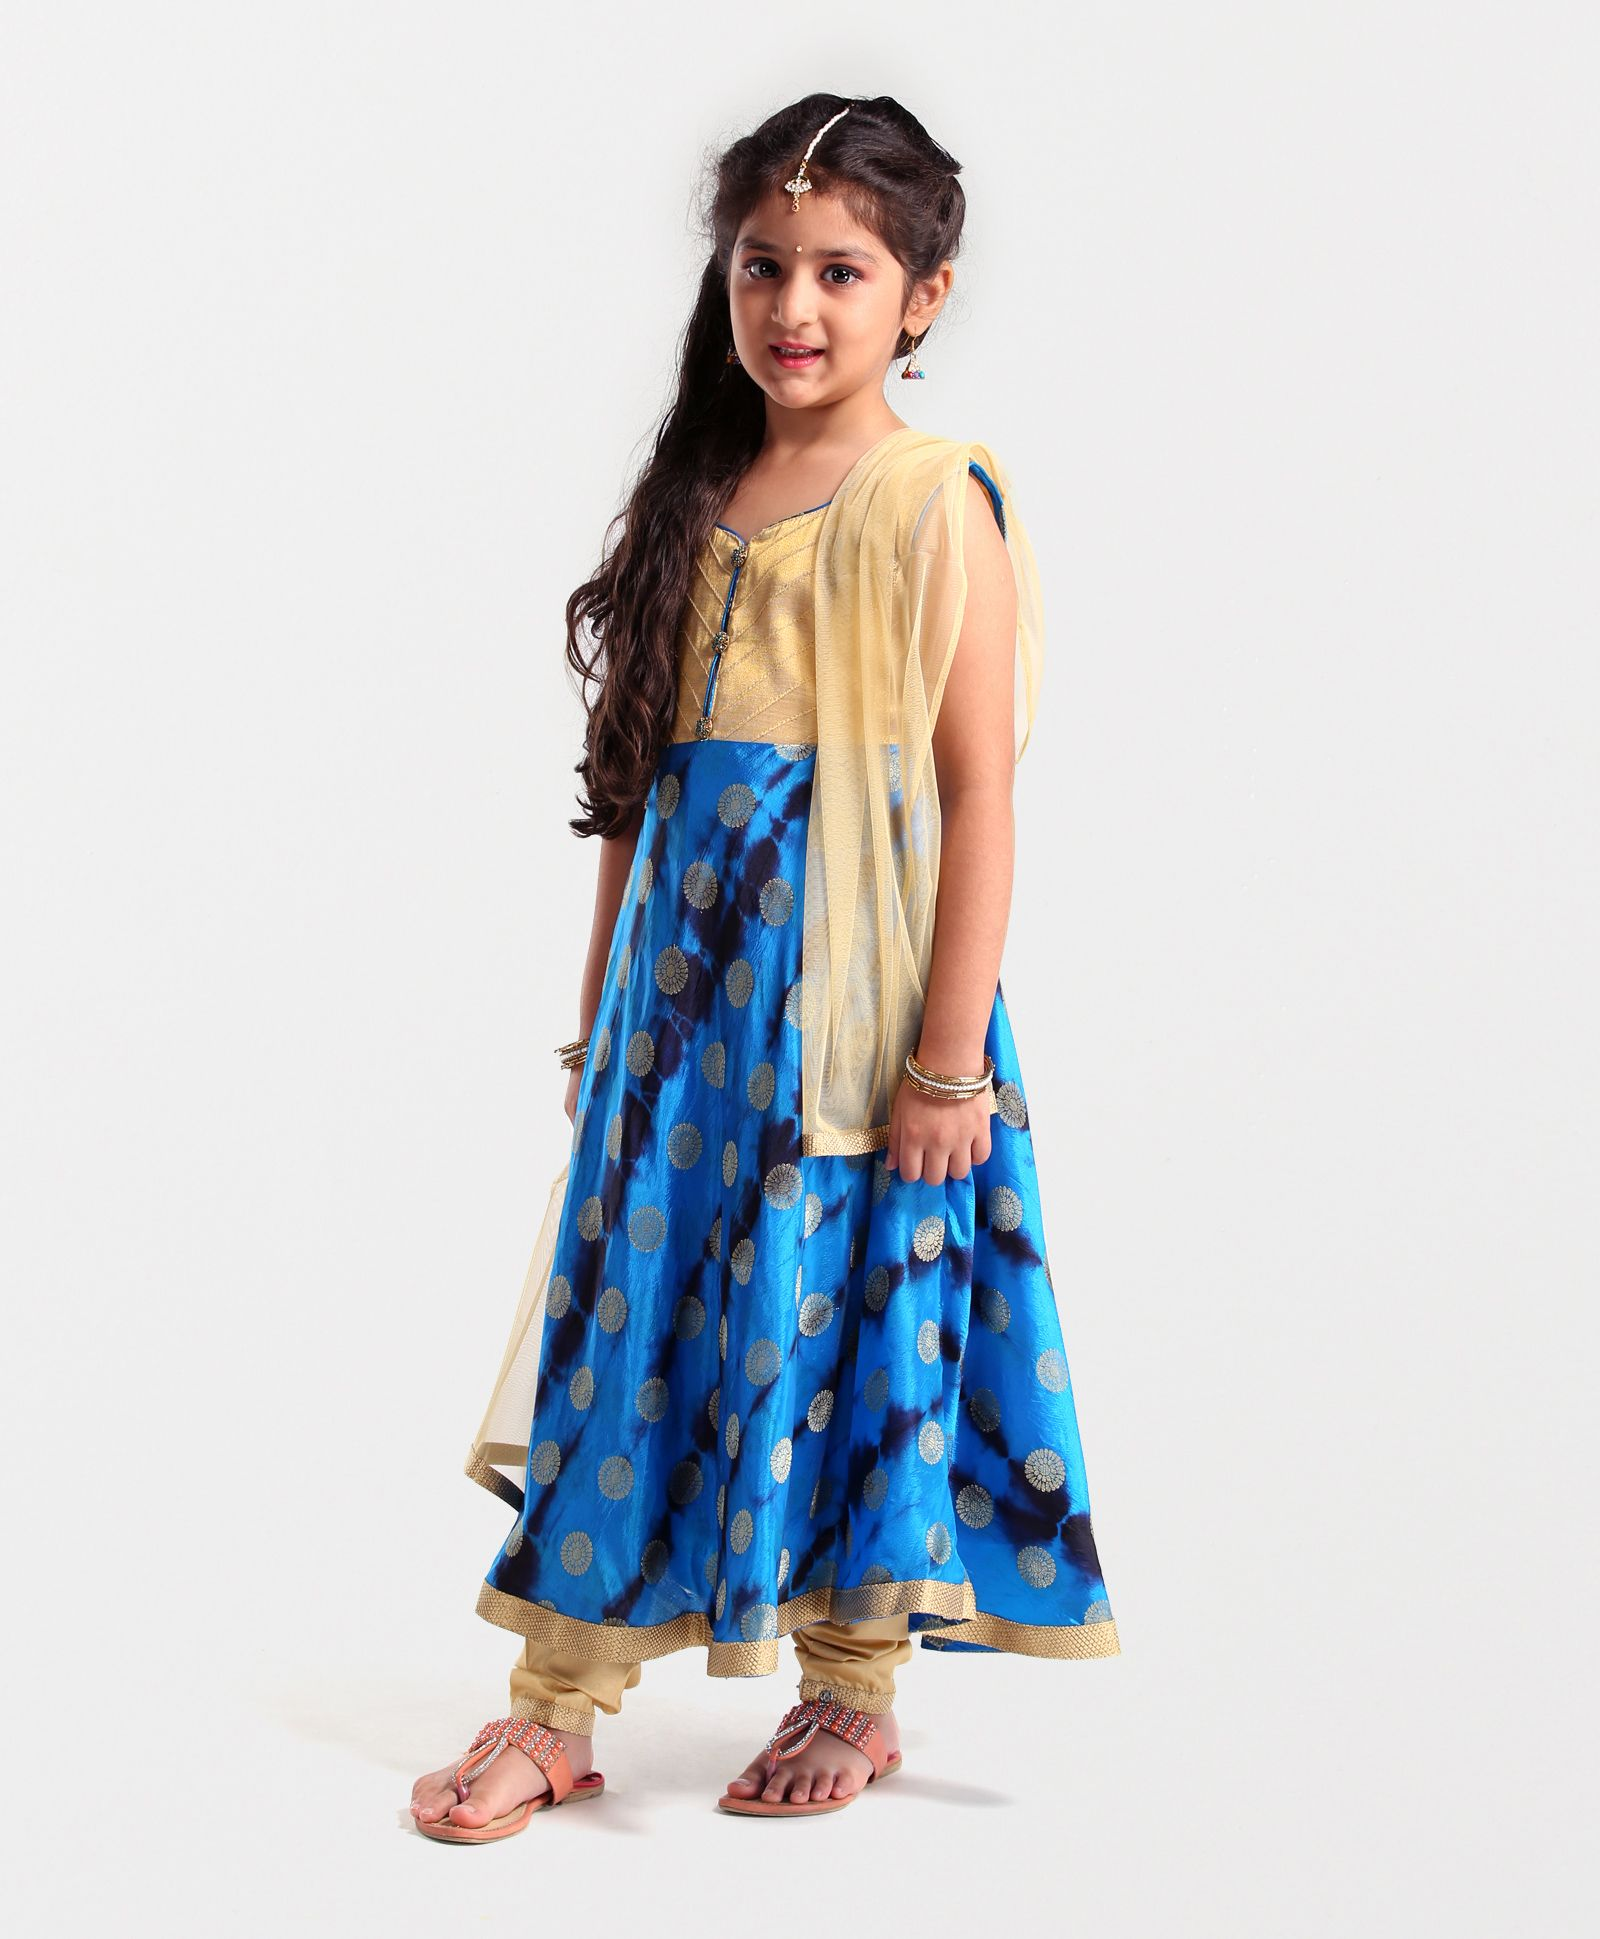 Babyhug Sleeveless Kurti And Salwaar With Dupatta Embroidered Design - Blue